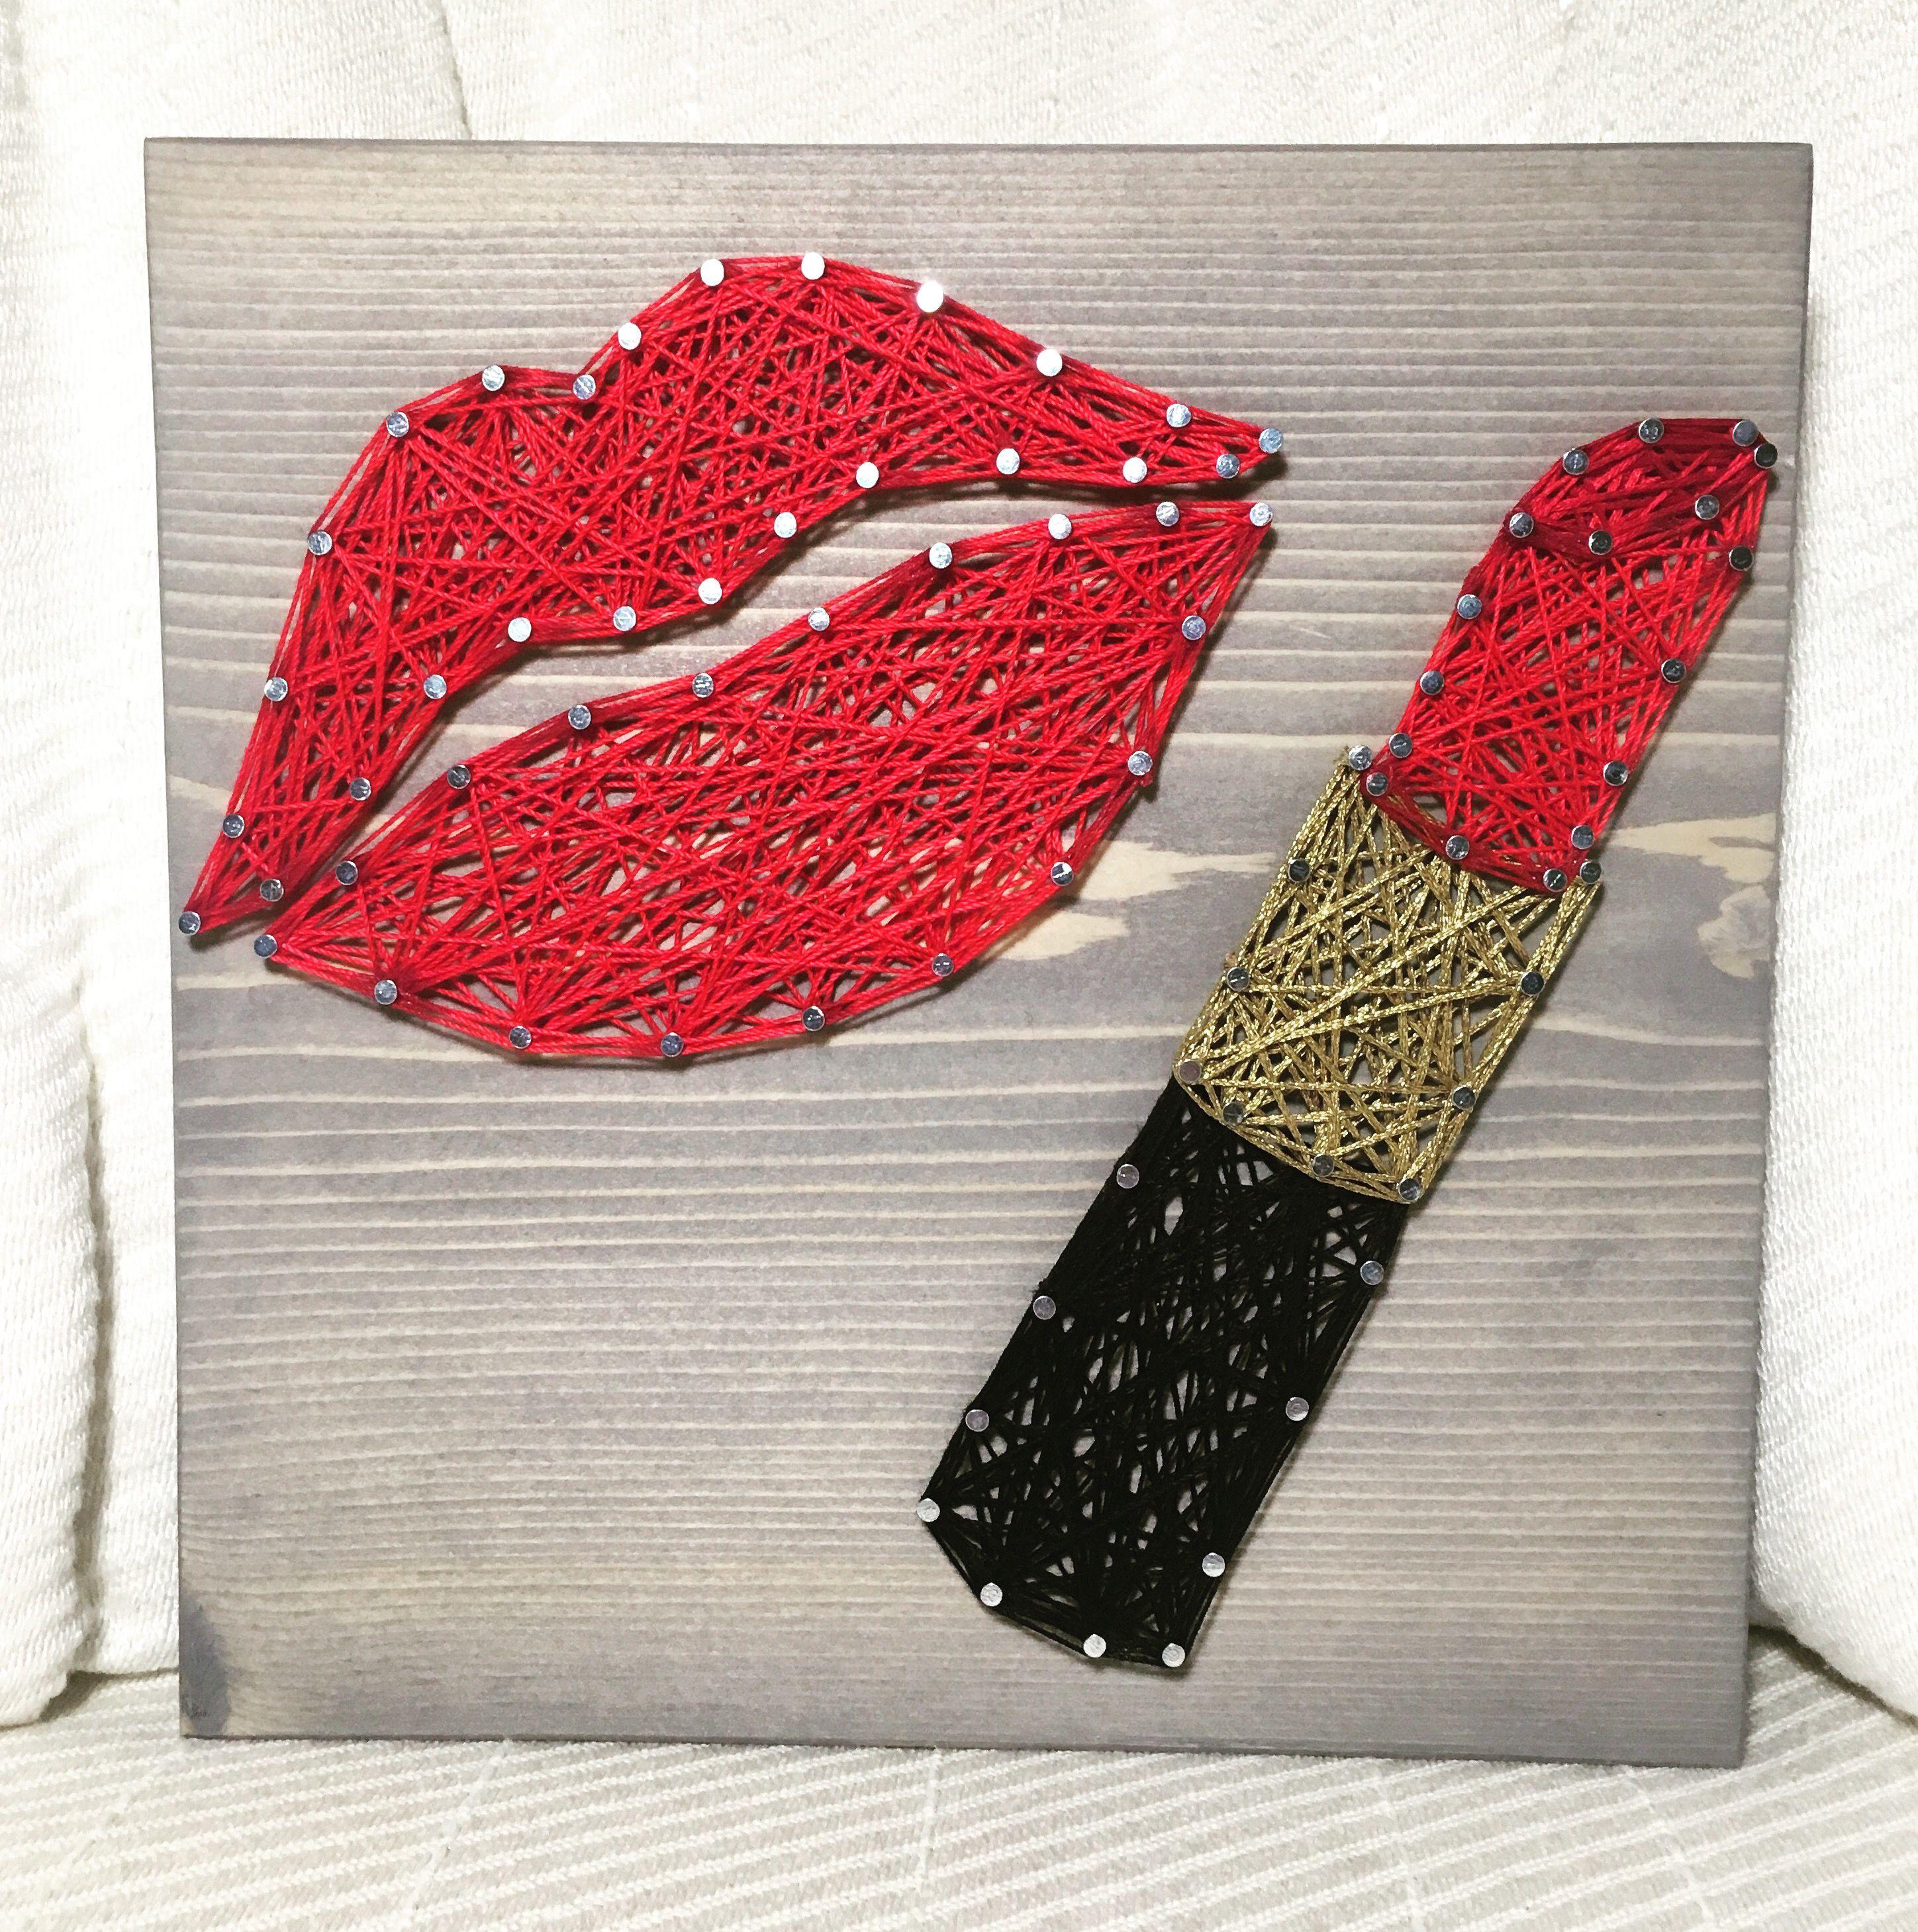 Lipstick Makeup Lips String Art, Makeup Artist- order from KiwiStrings on Etsy! www.kiwistrings.etsy.com